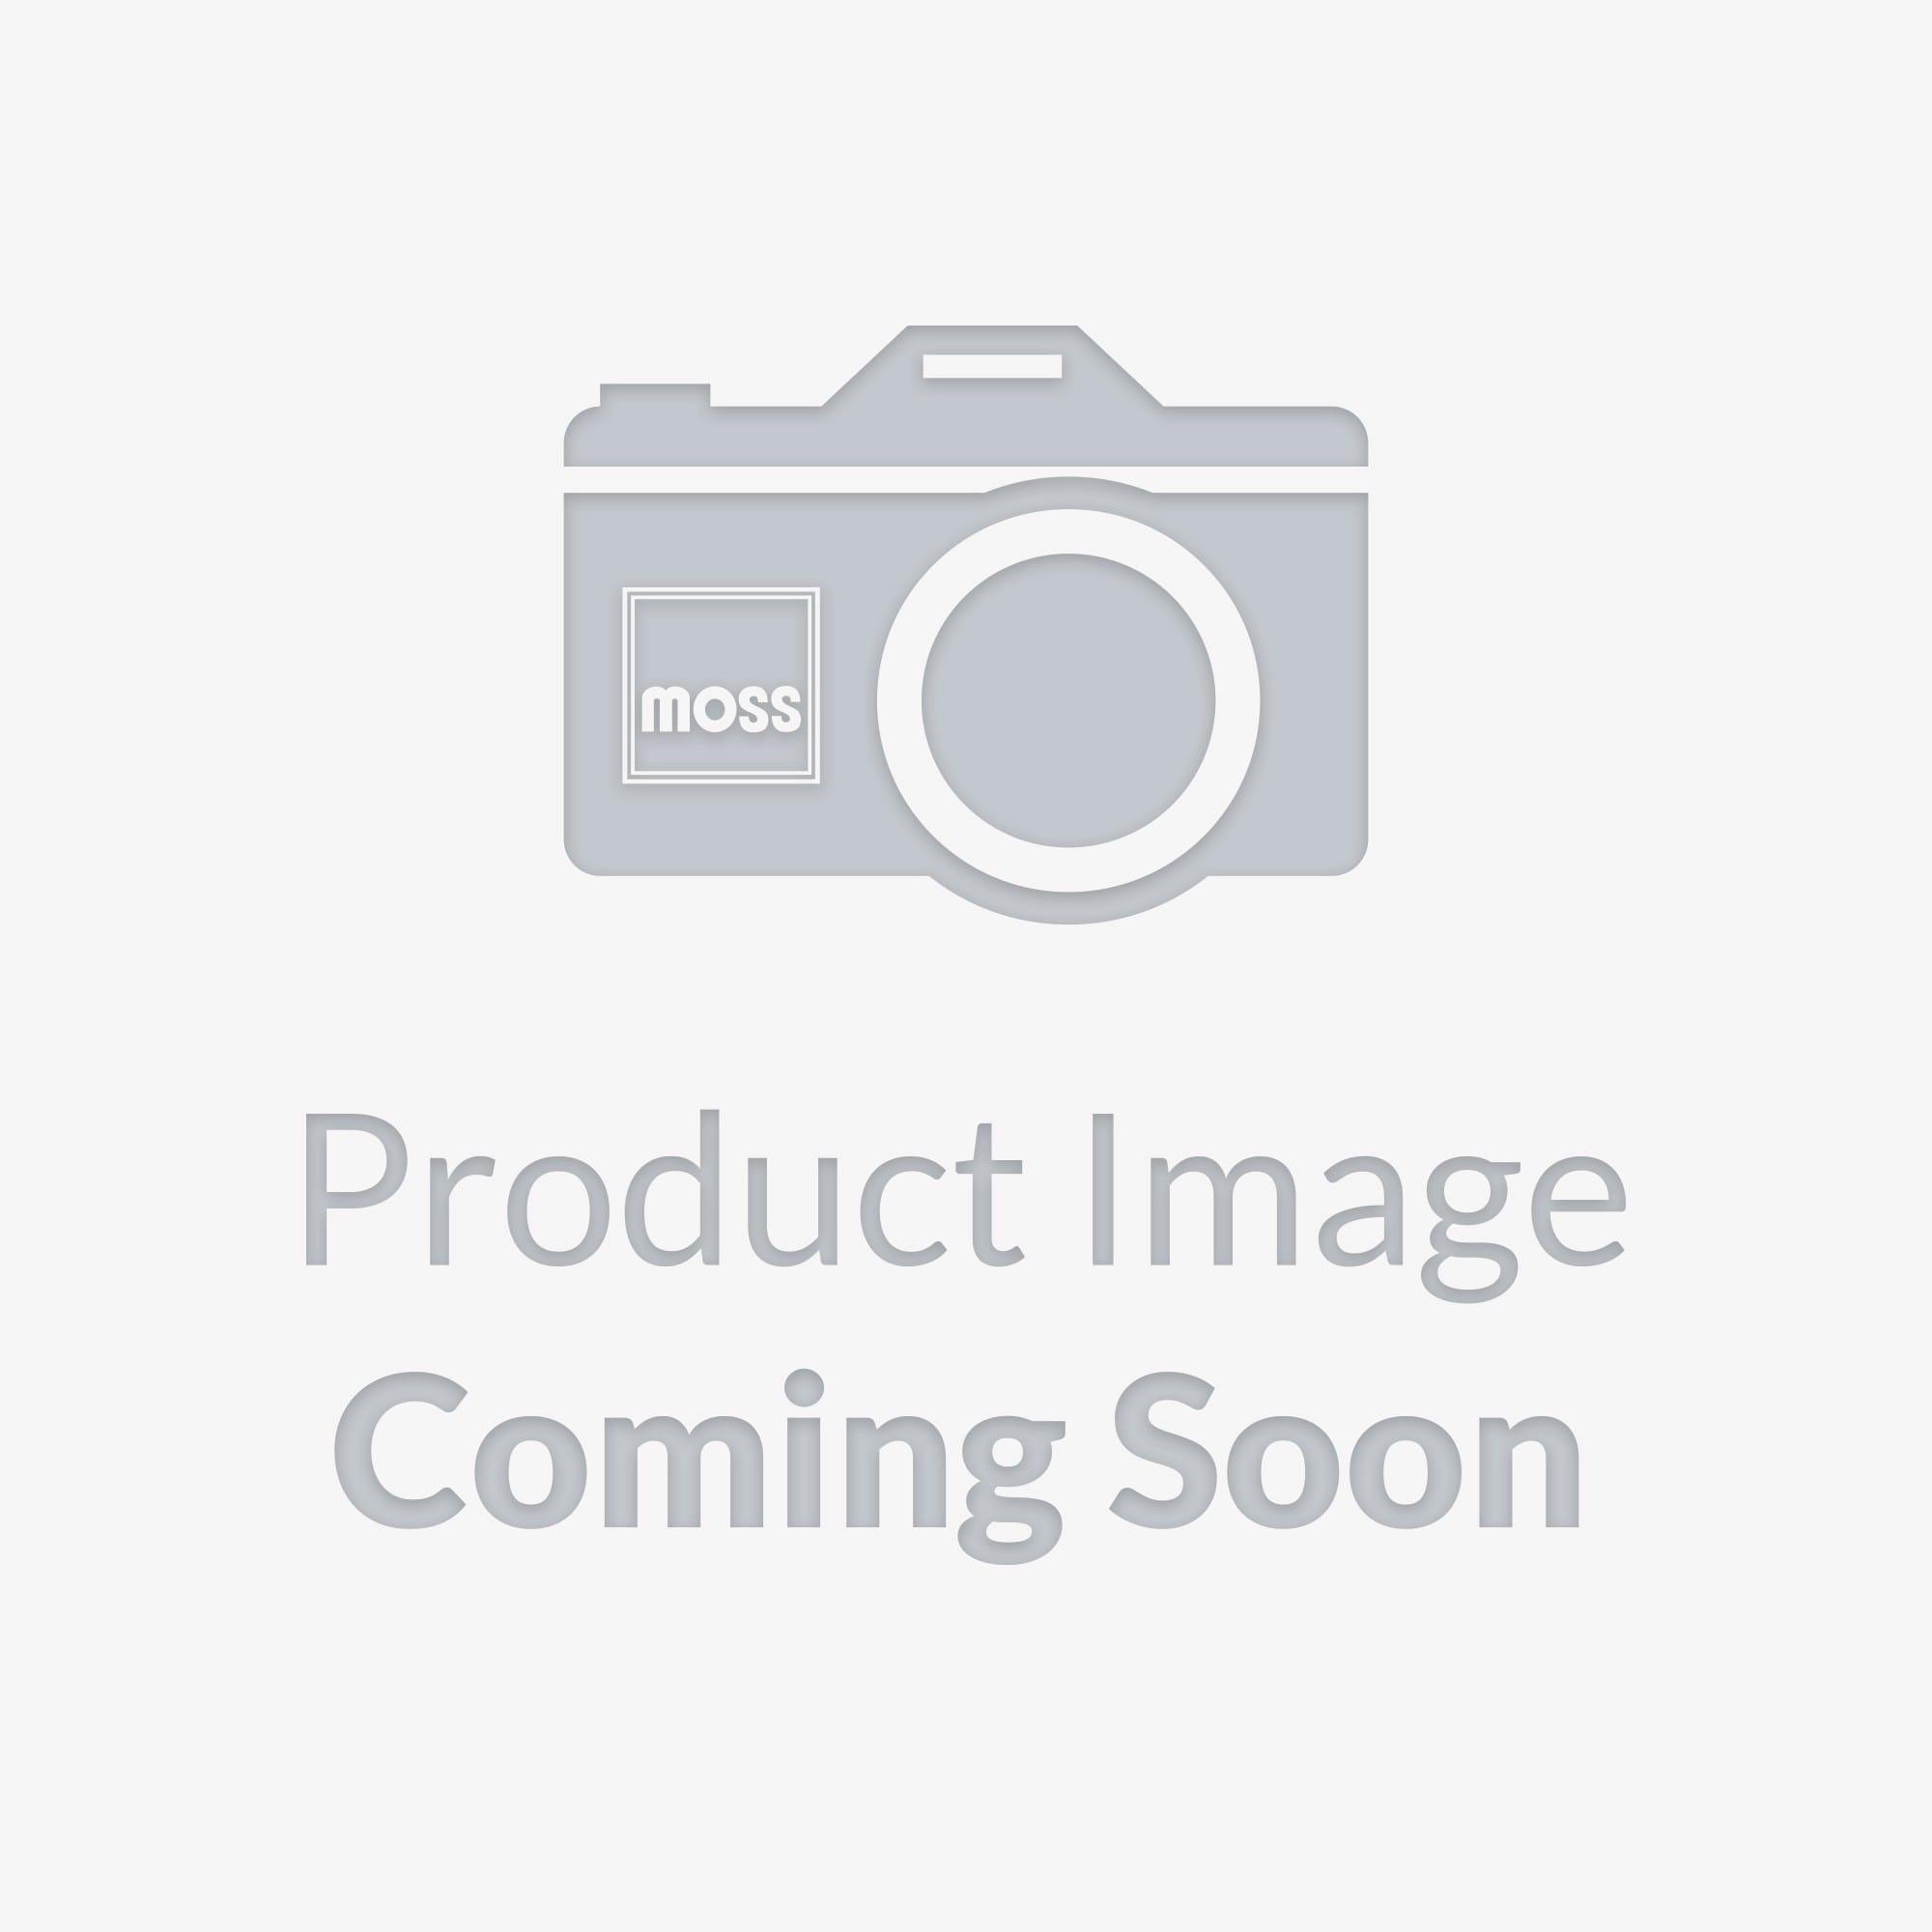 680 254 body rubber repaint kit tr4a tr250 moss motors 1974 Fiat Four-Door body rubber repaint kit tr4a tr250